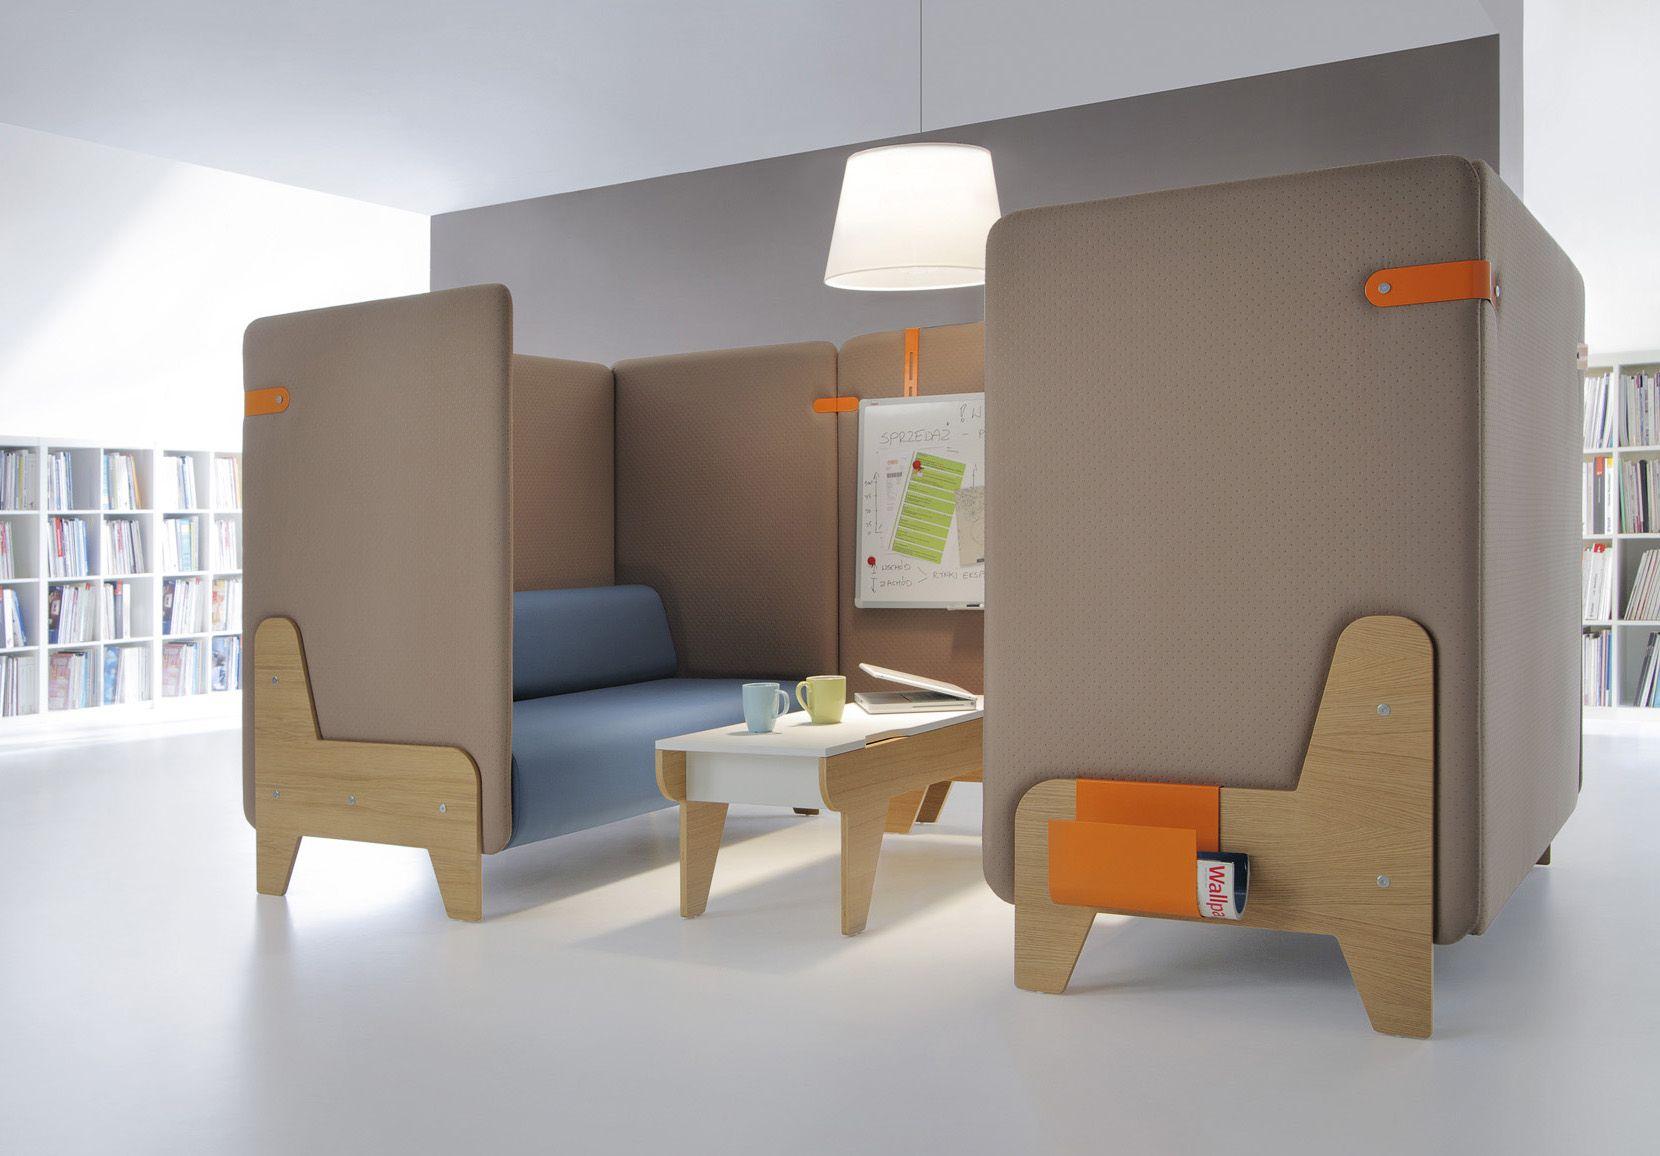 Home Interior Design, Räume, Getränke, Möbel, Bildschirme, Telephone Call,  Drink Coffee, Need To